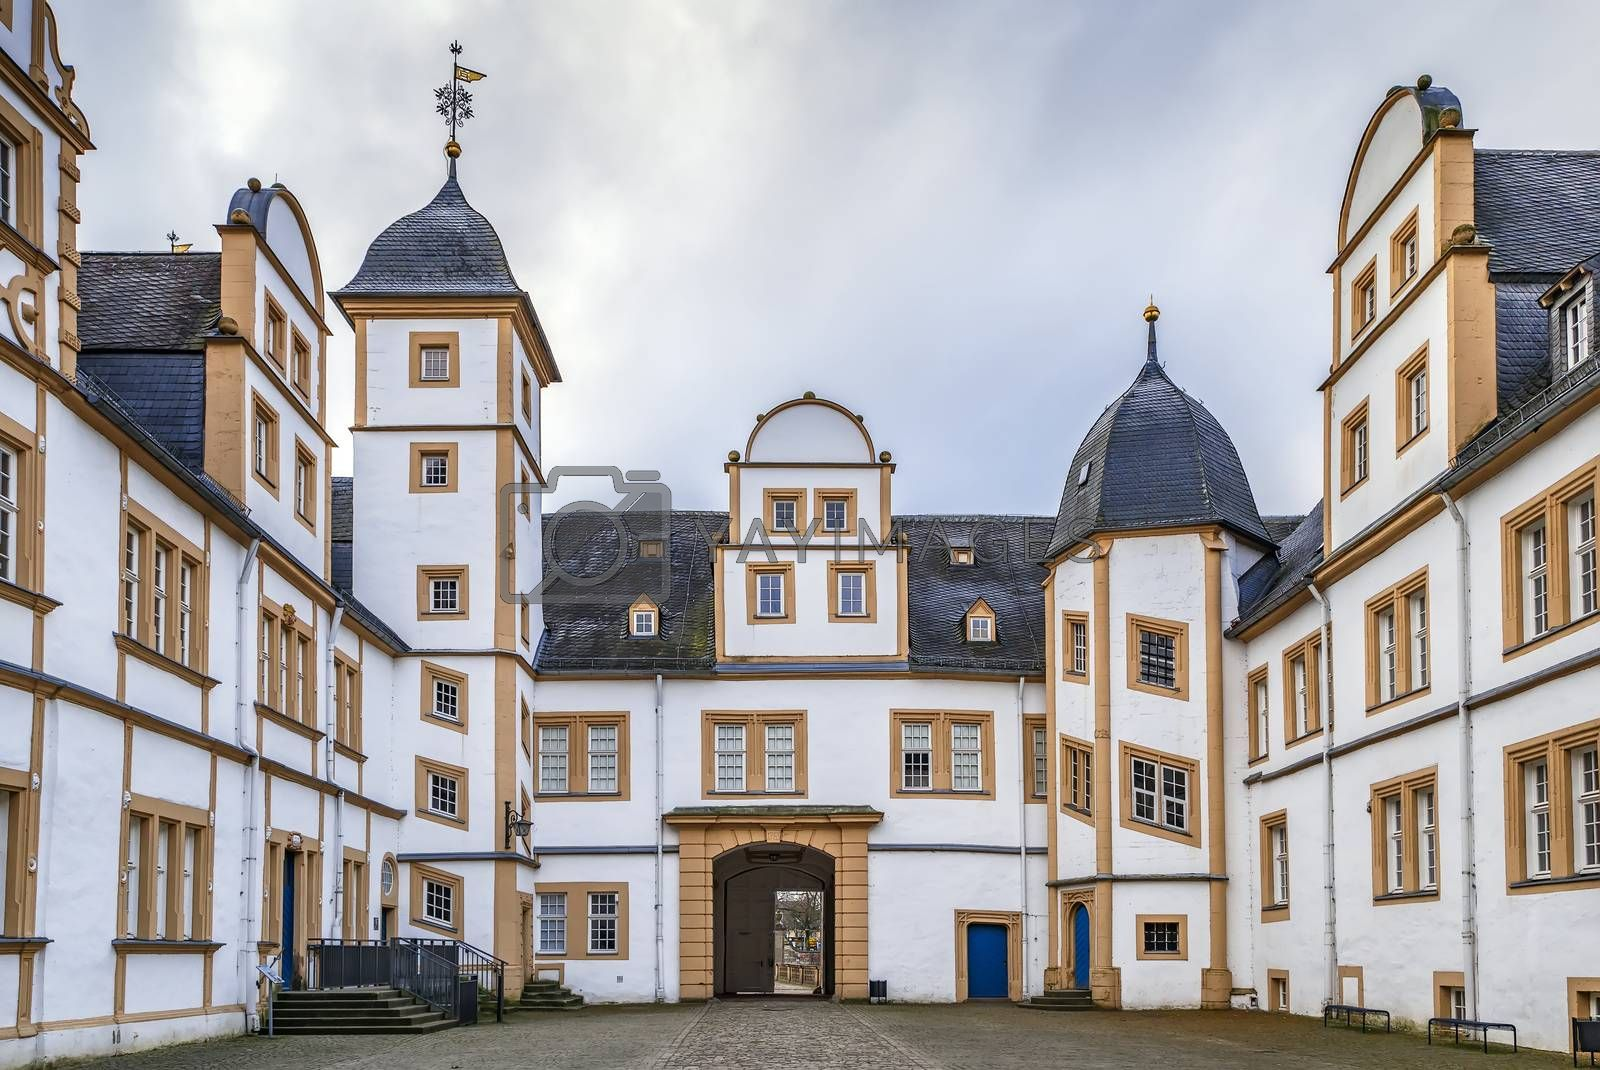 Royalty free image of Neuhaus Castle in Paderborn, Germany by borisb17